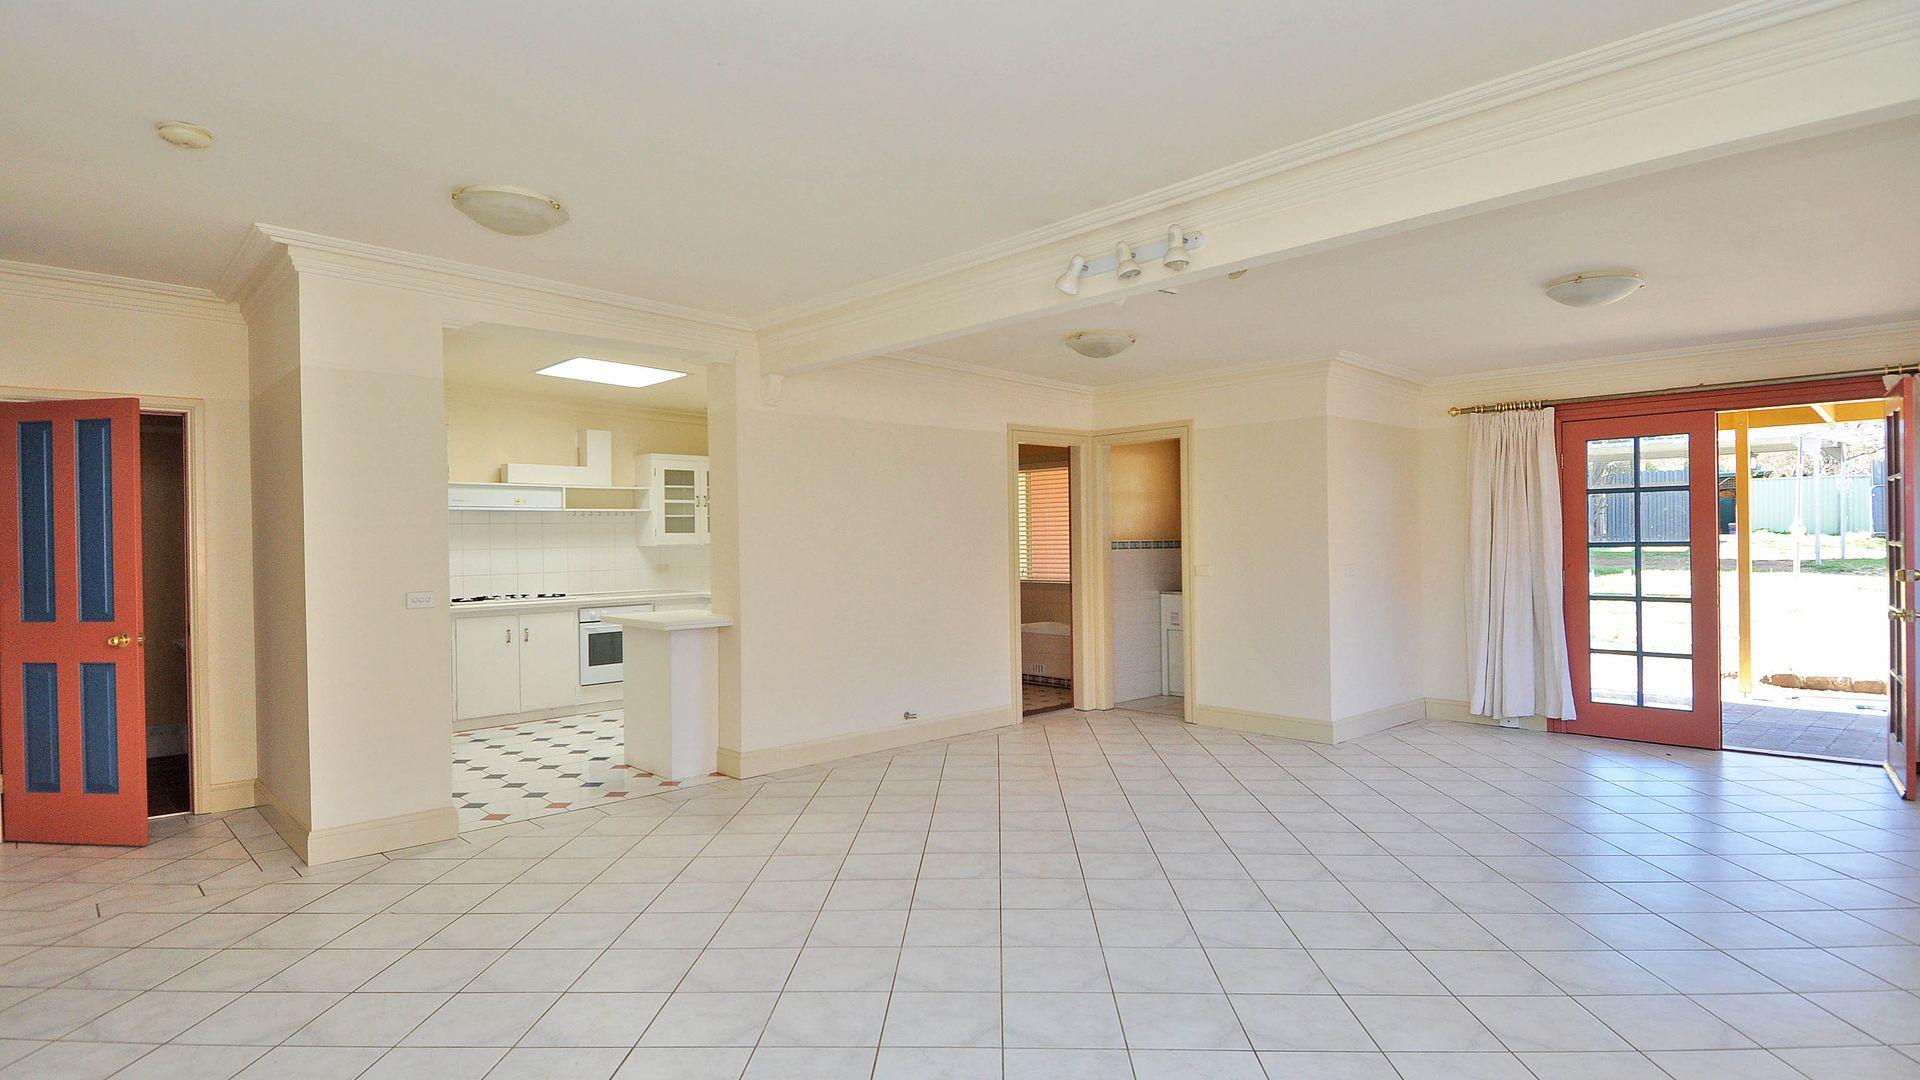 15 Blandford Street, Bathurst NSW 2795, Image 2